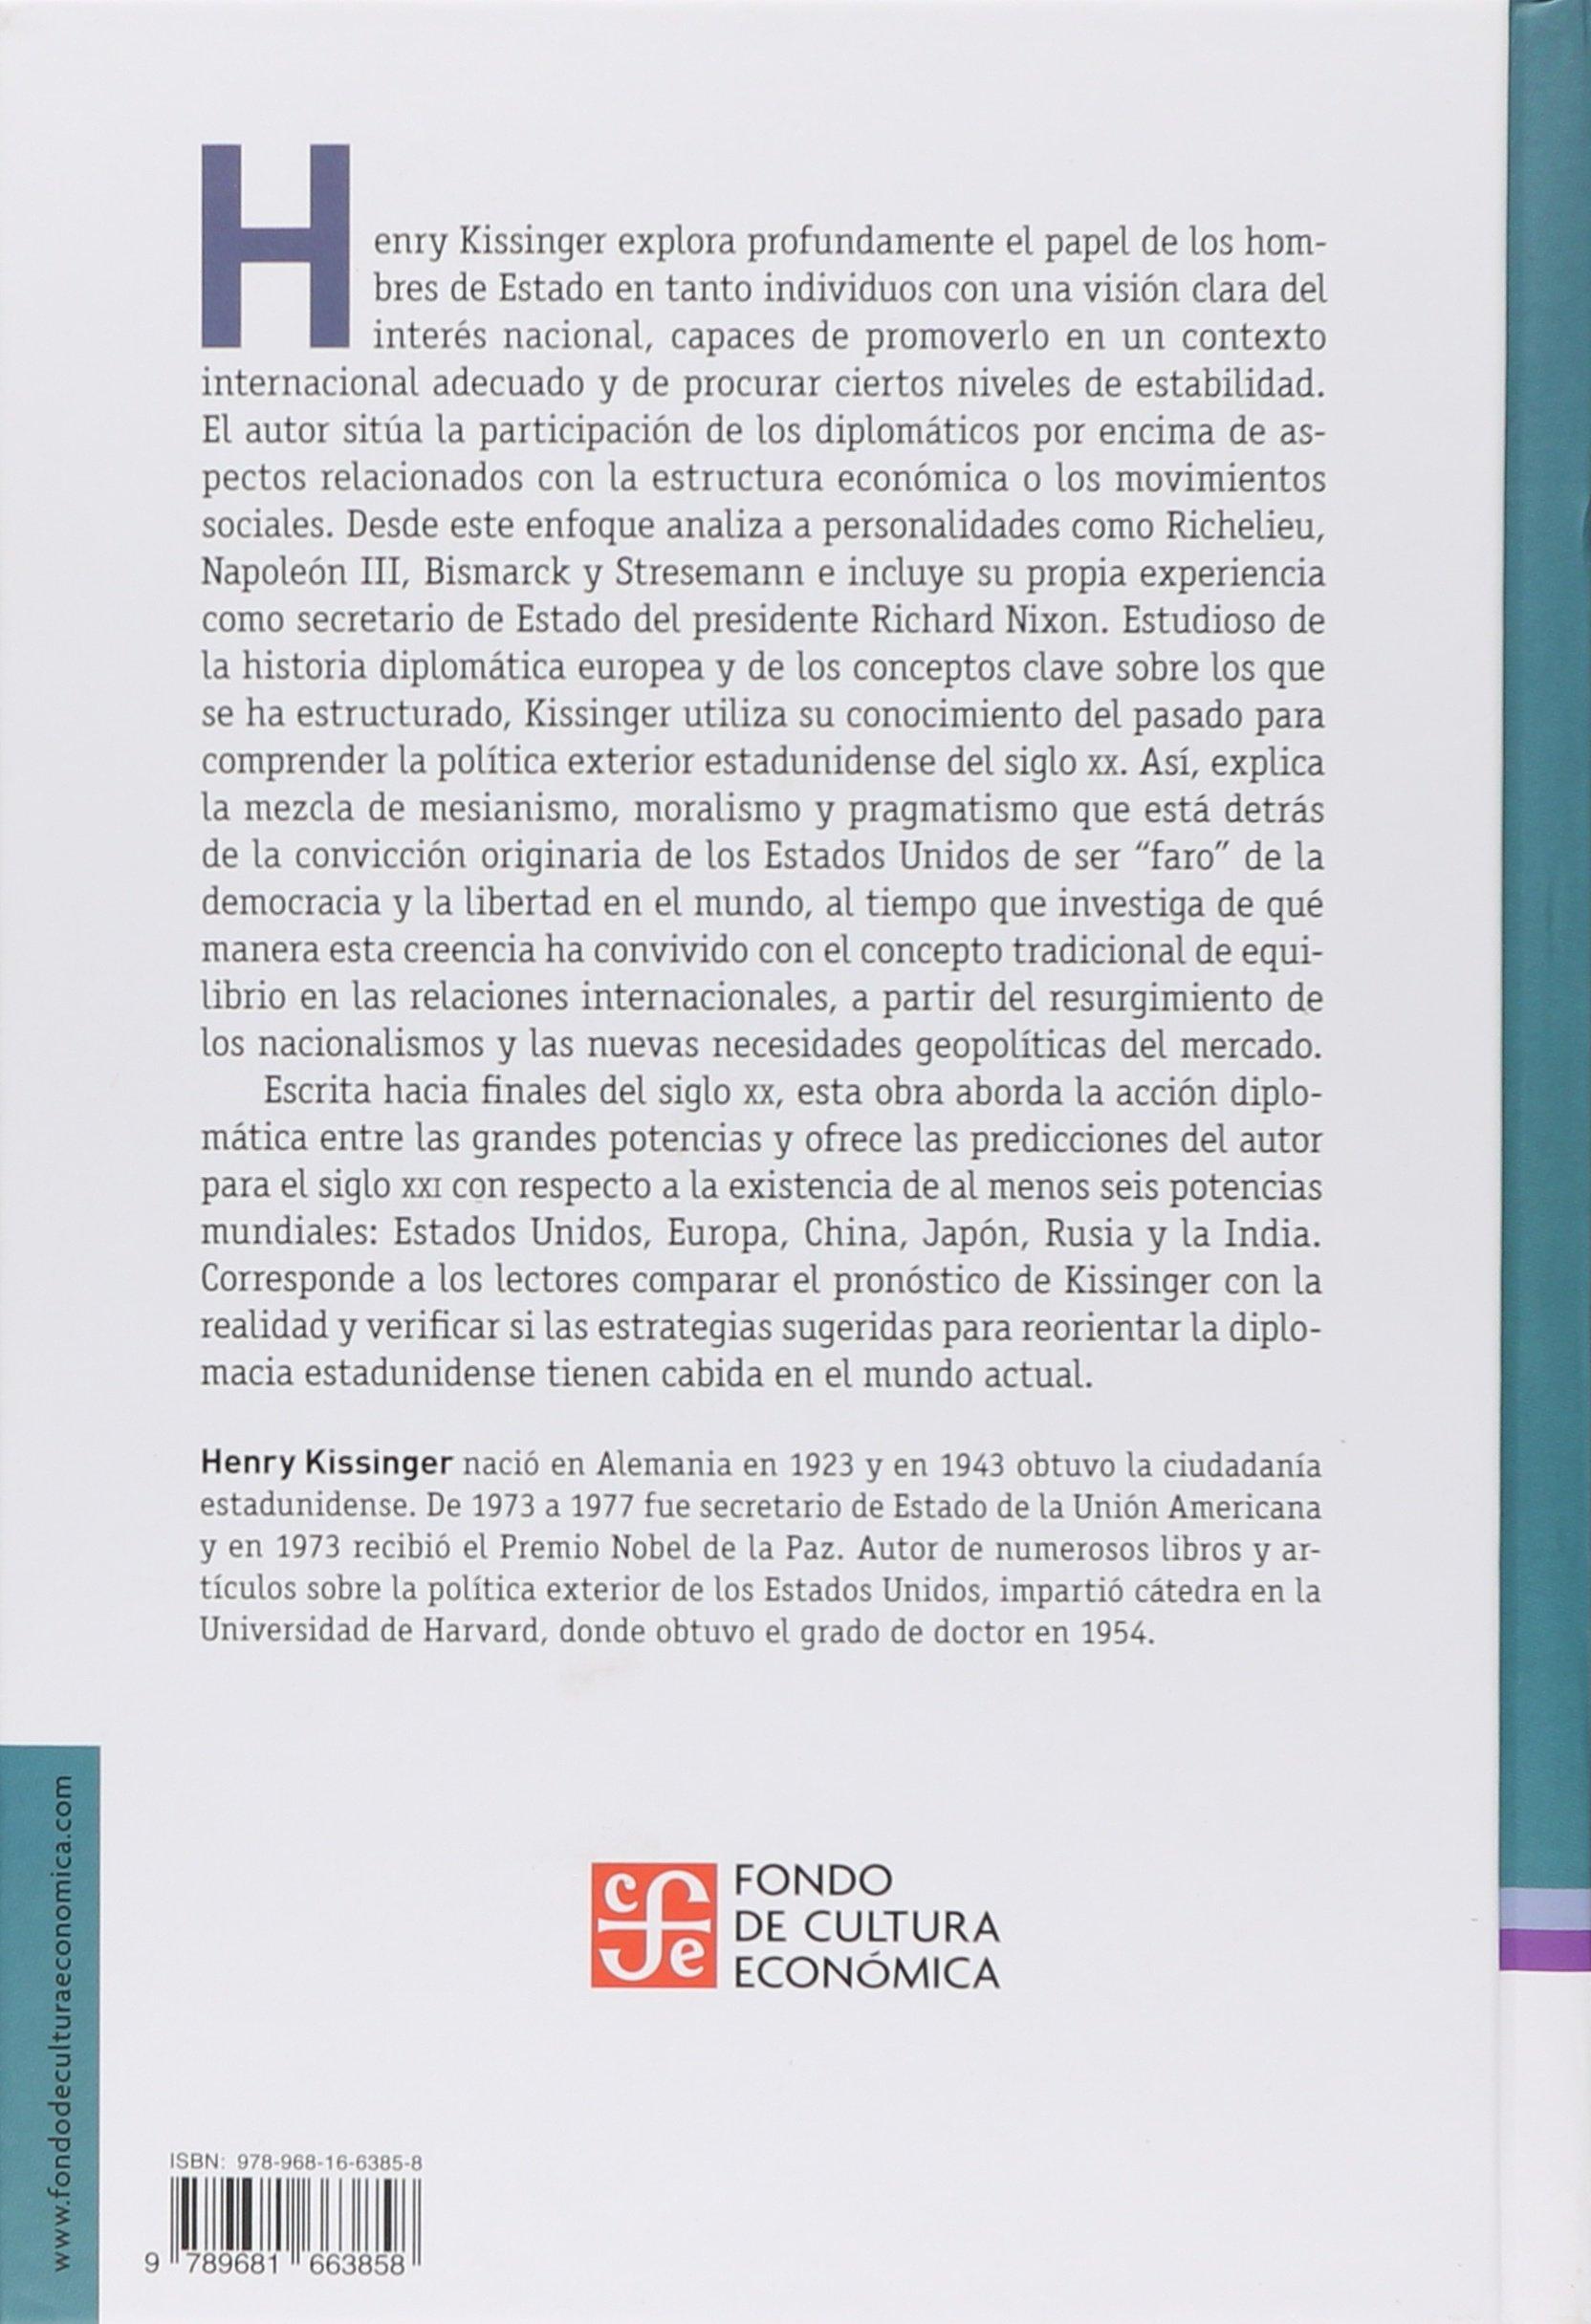 La diplomacia (Spanish Edition): Kissinger Henry ...